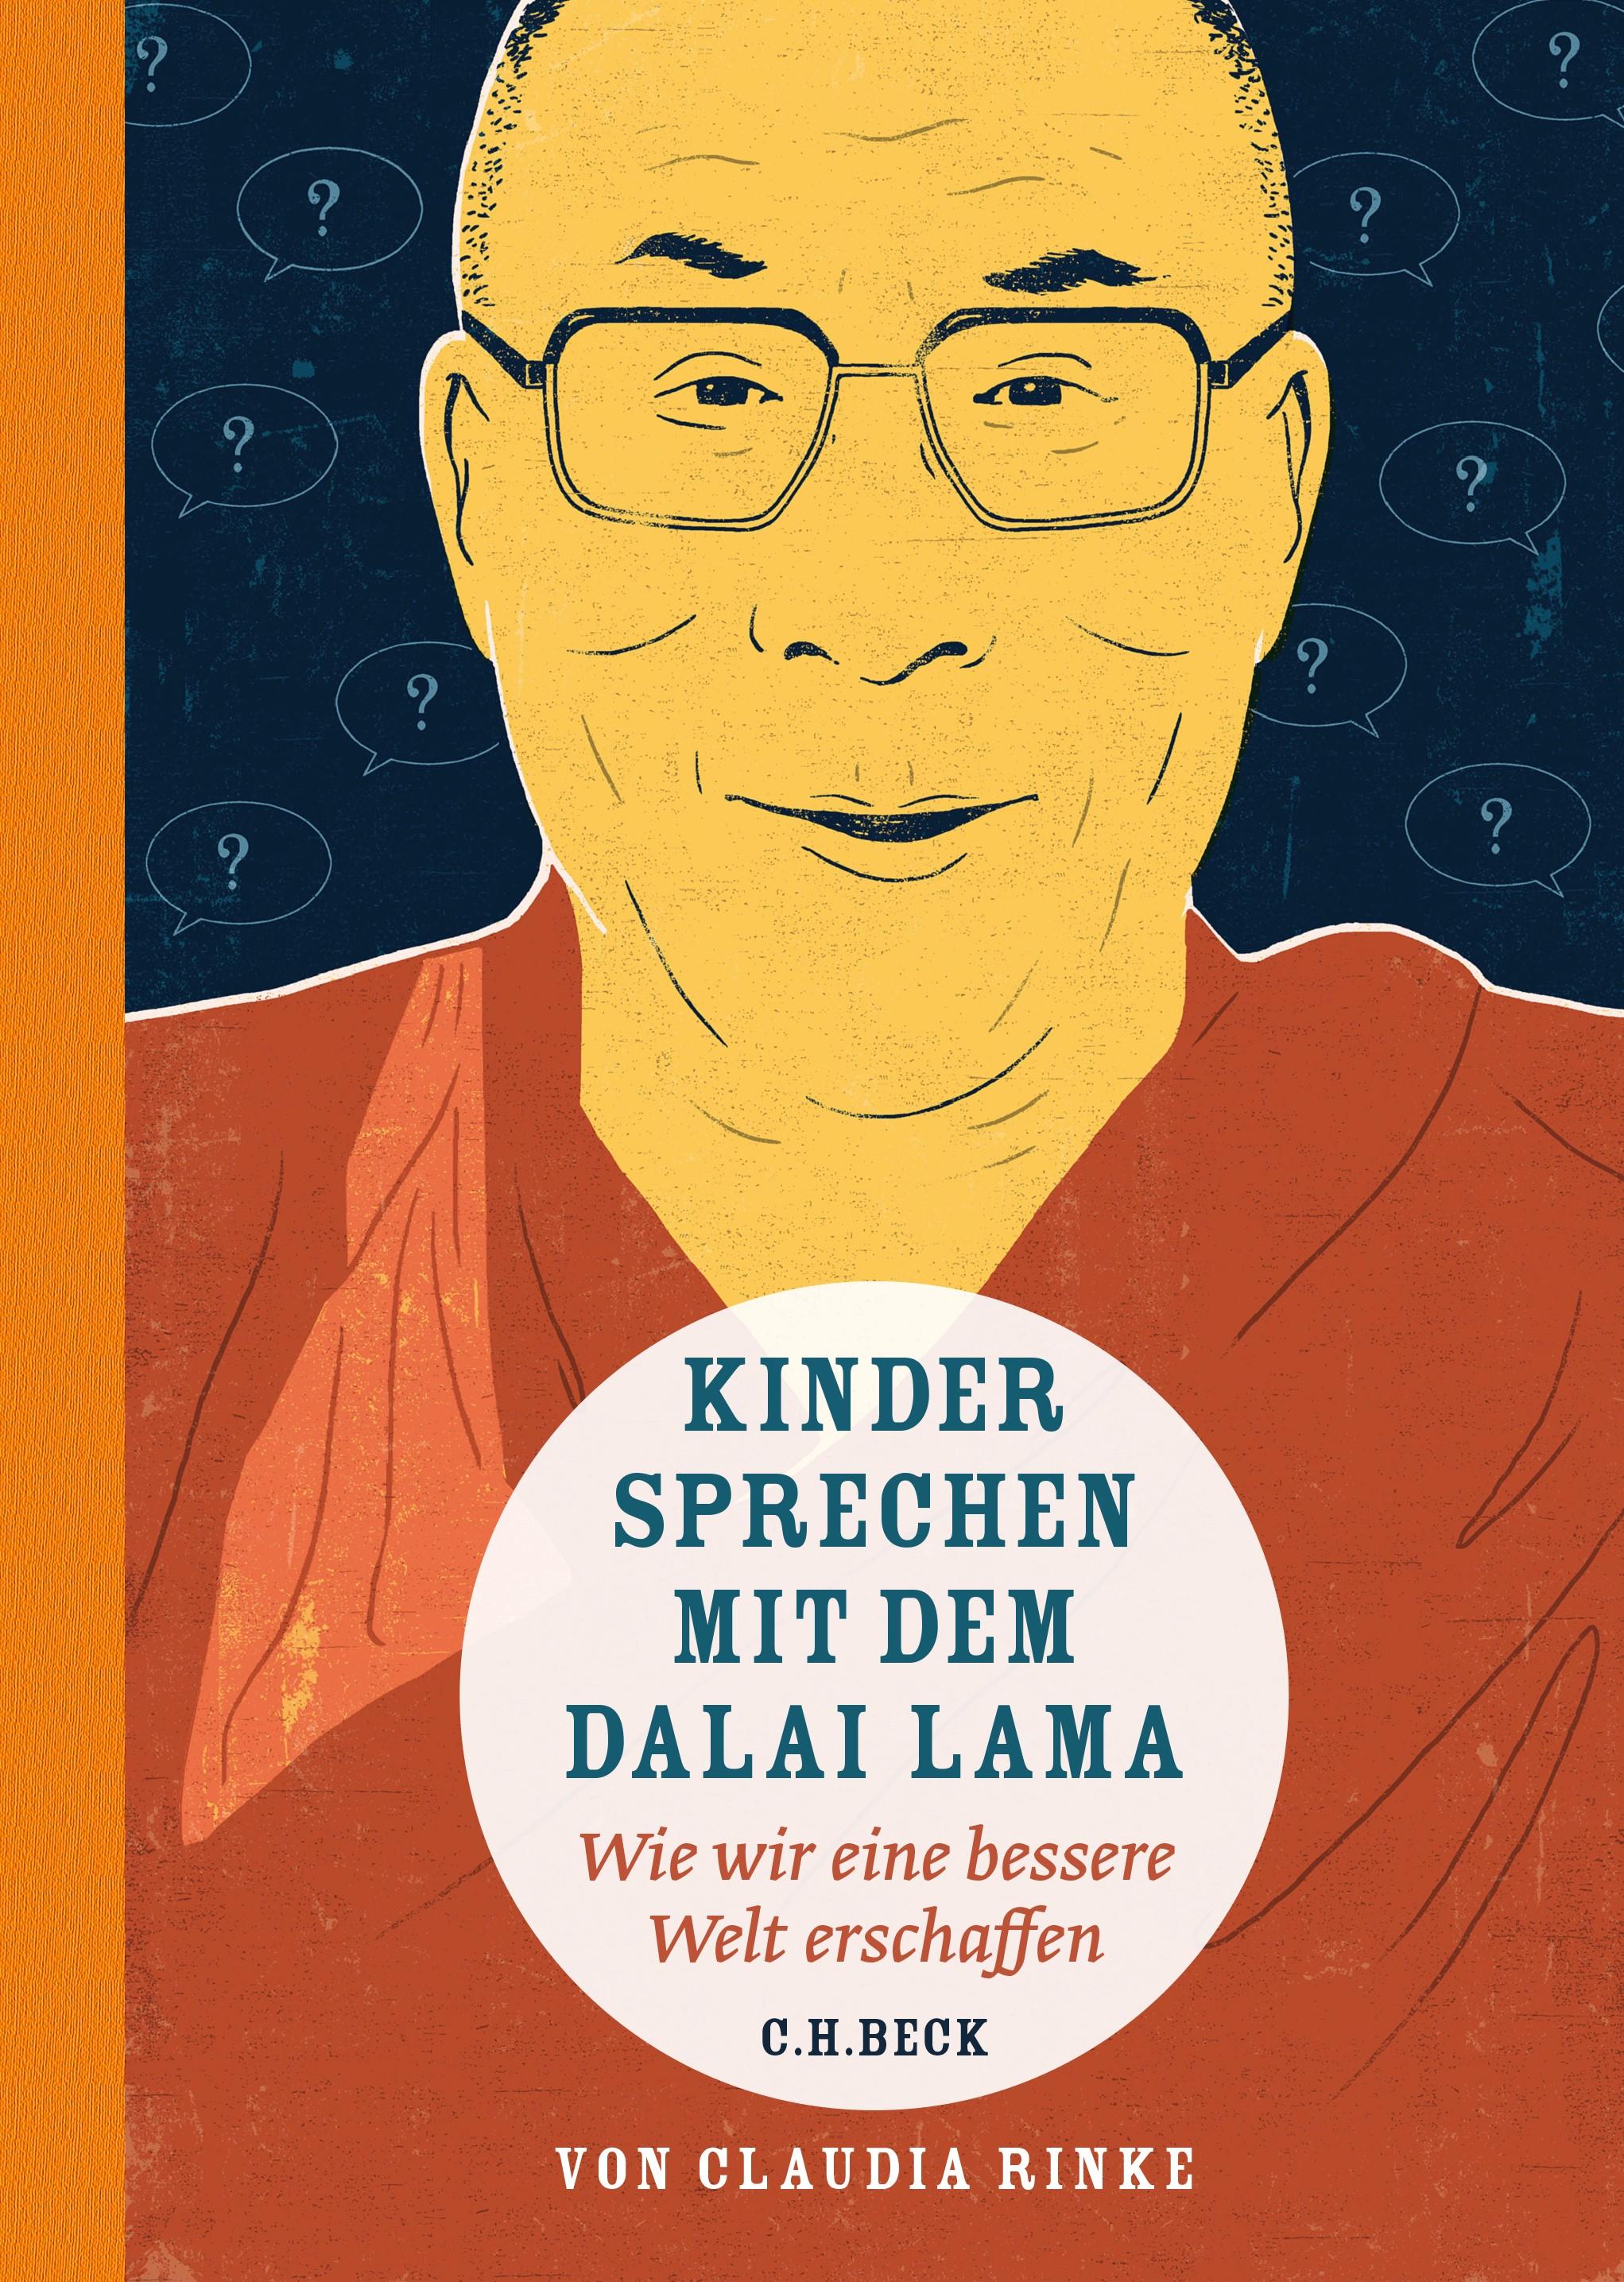 Cover des Buches 'Kinder sprechen mit dem Dalai Lama'